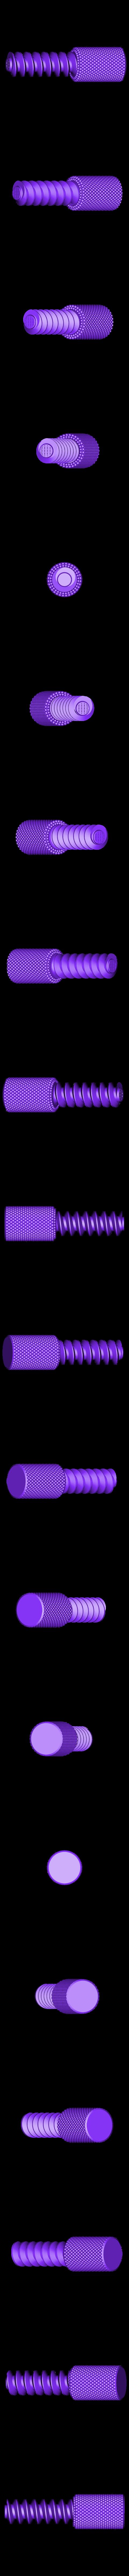 nutcracker-handle.stl Download free STL file Nut & walnut cracker [My grandma design] • 3D print design, 3d-dragar